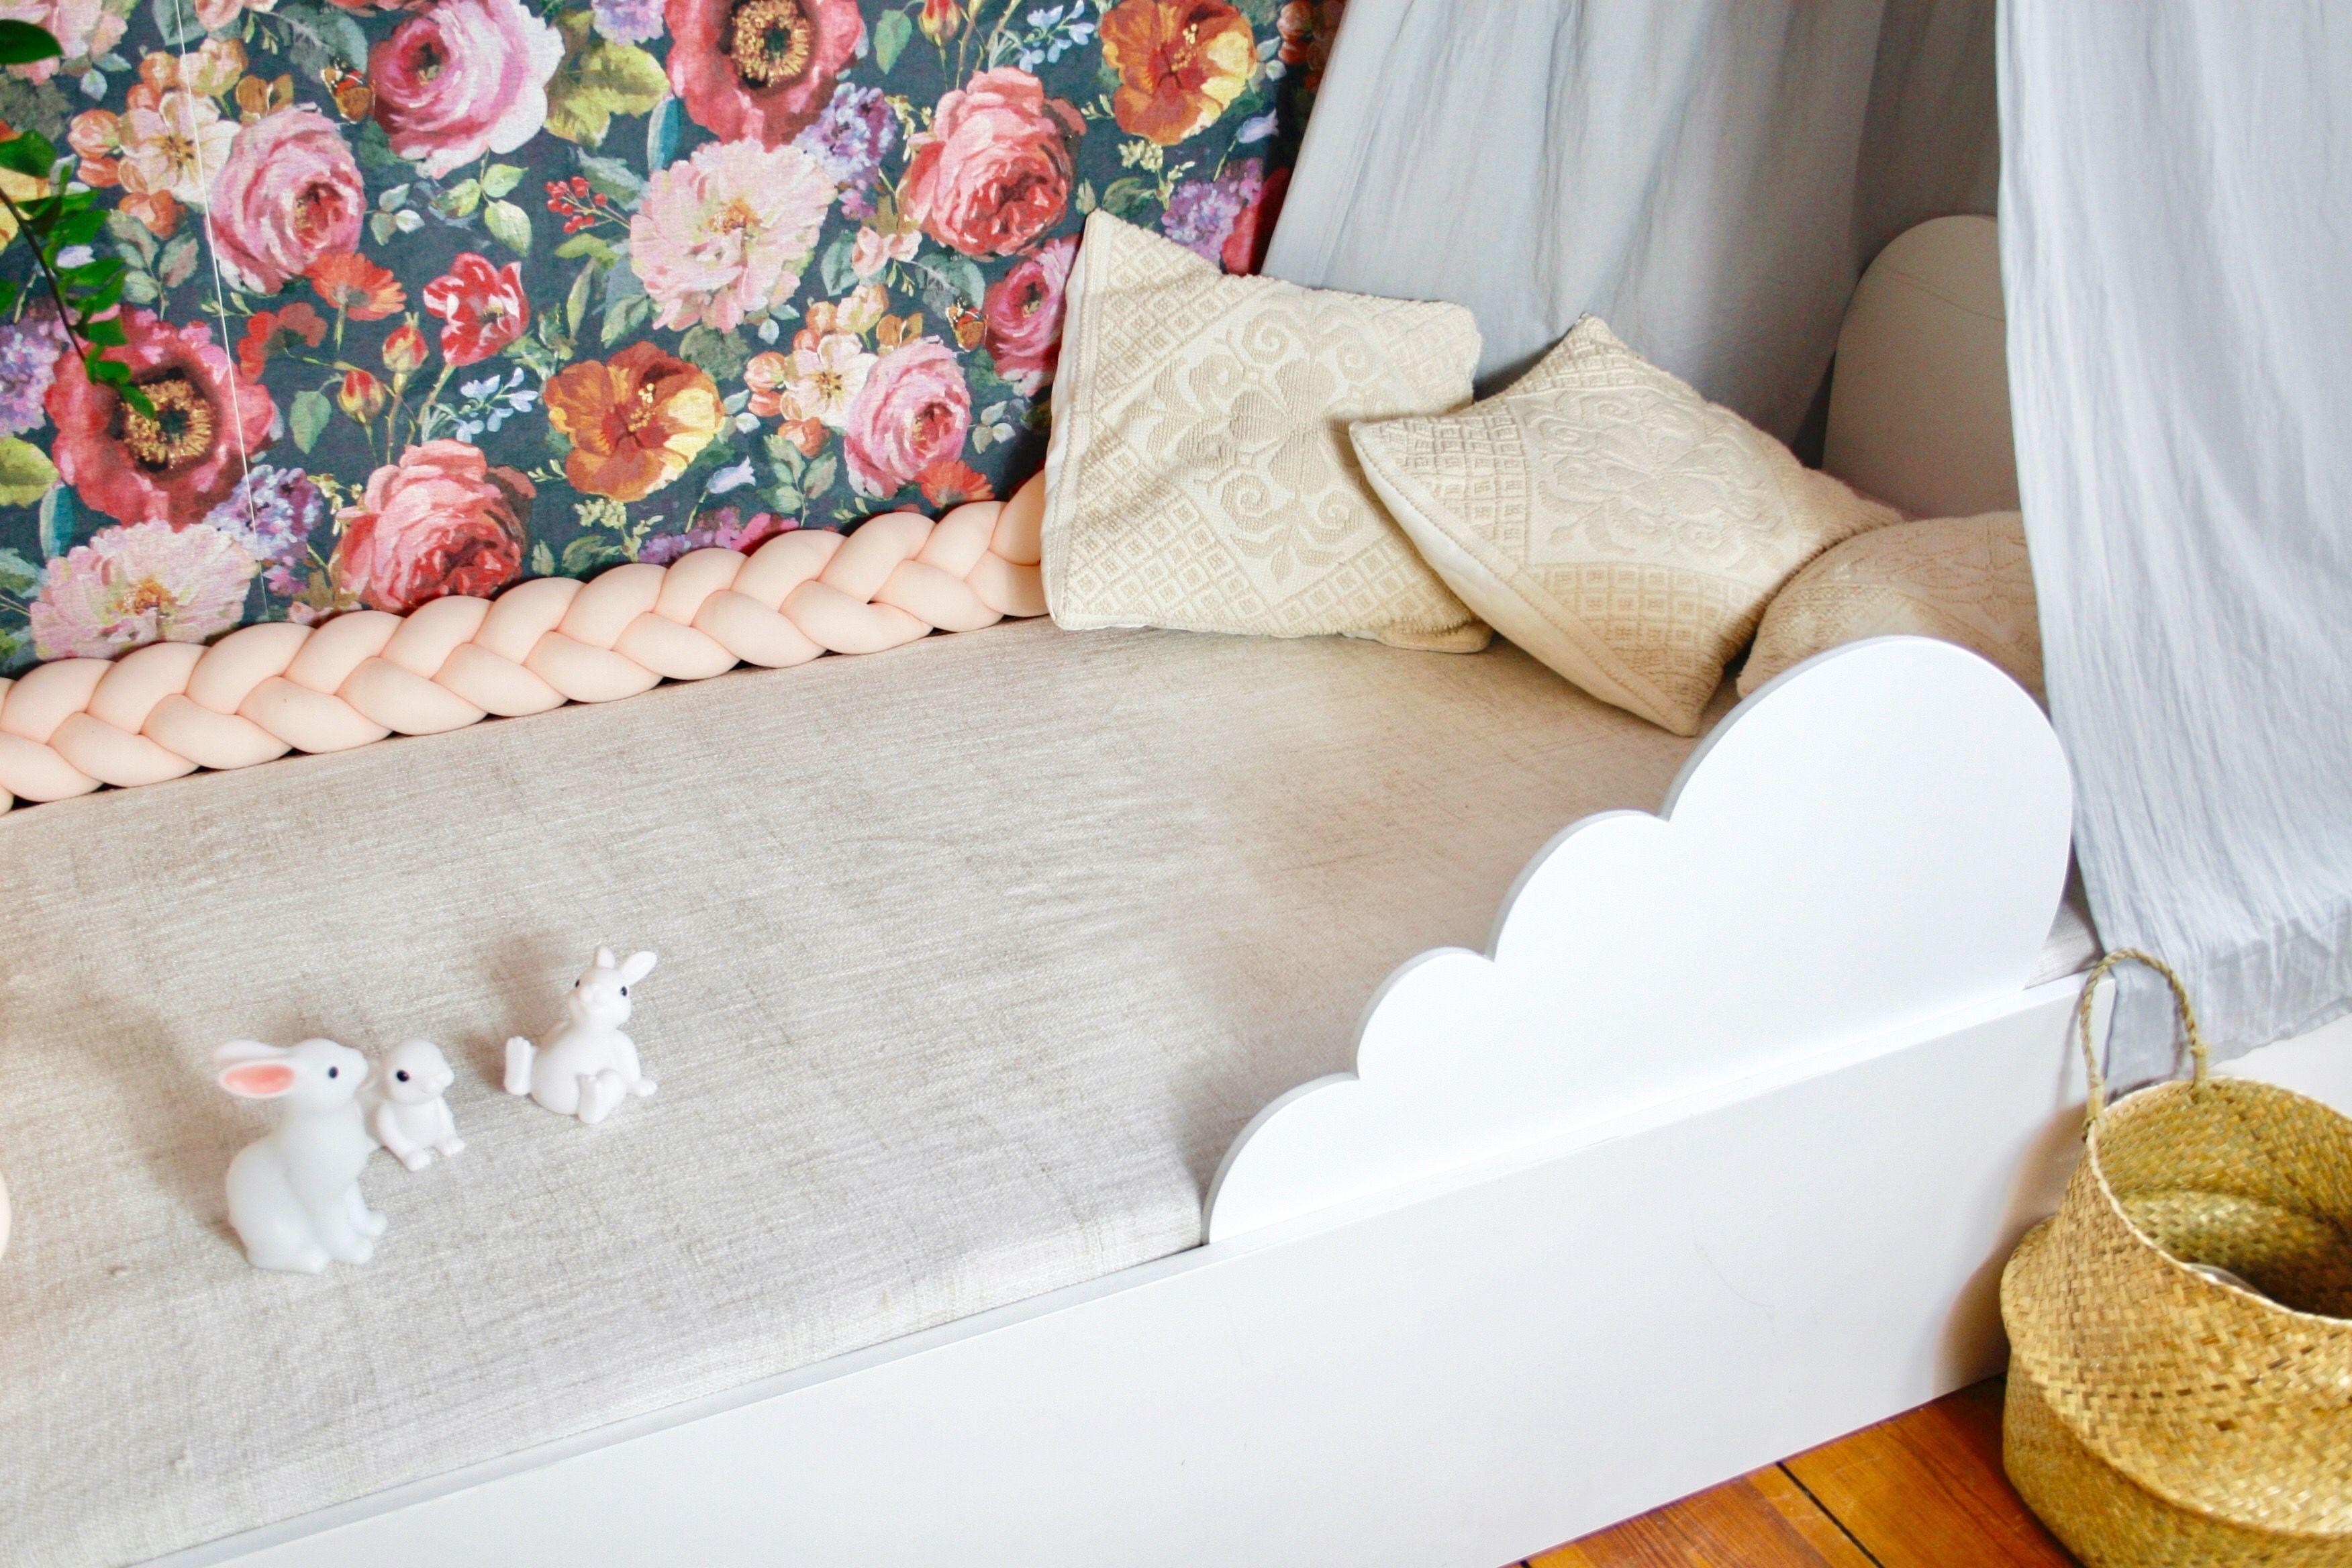 Küche stößt auf ideen roomoon rausfallschutz bedrail kinderzimmer kidsroom kidsroomdecor